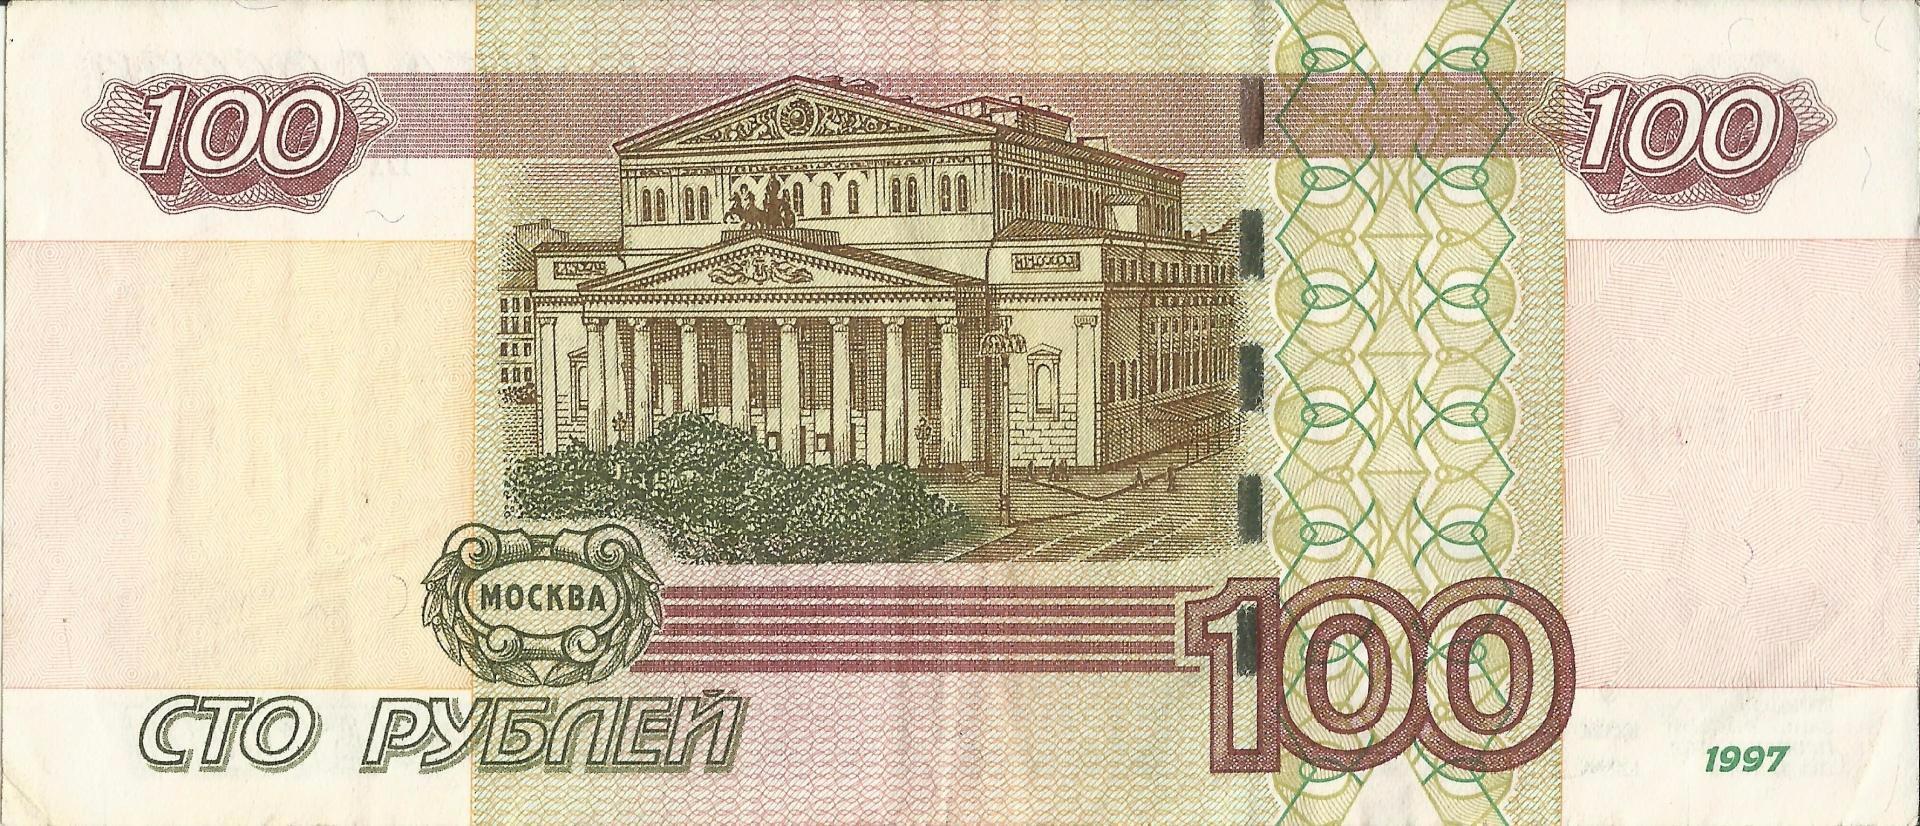 займы онлайн 100000 рублей